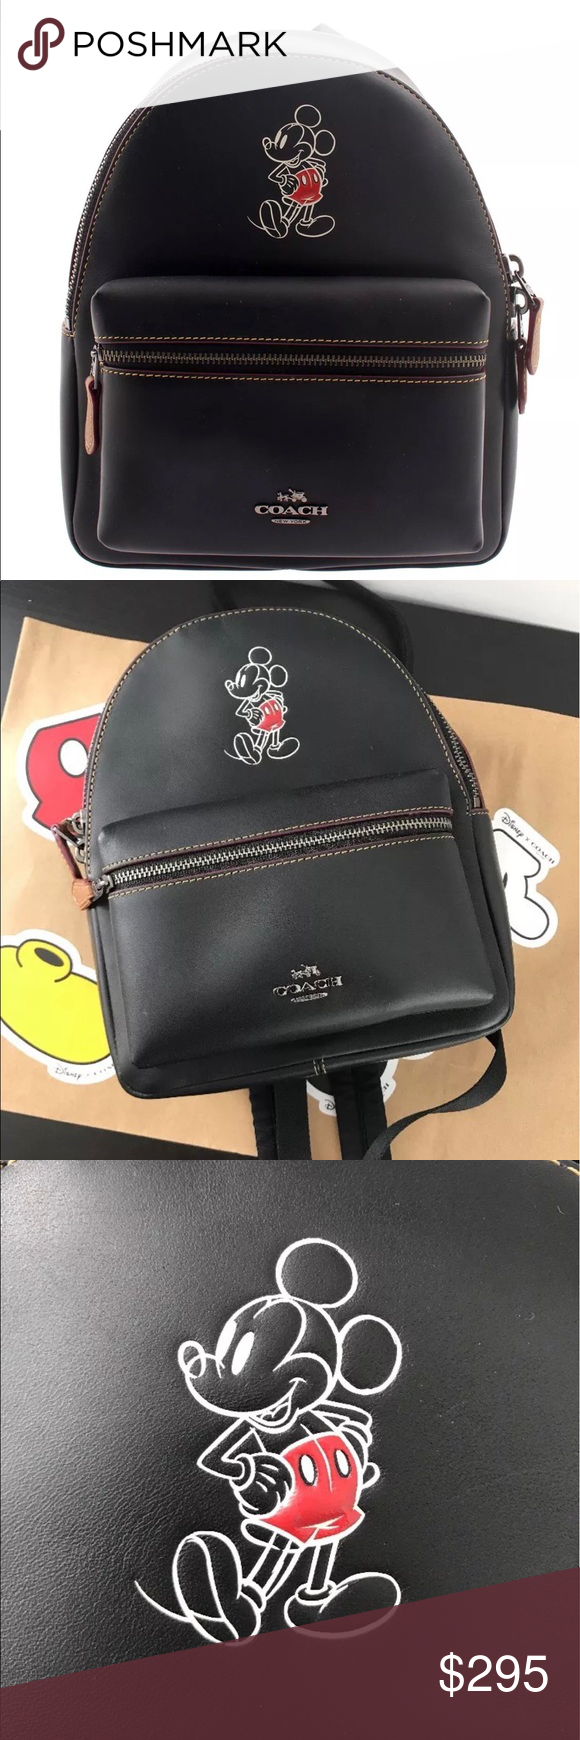 c14165a27e3 COACH X DISNEY MICKEY Mini Charlie backpack 100% authentic Used Disney X  Coach F59837 Mini Charlie Backpack Glove Calf Leather Mickey Black Limited  Edition ...